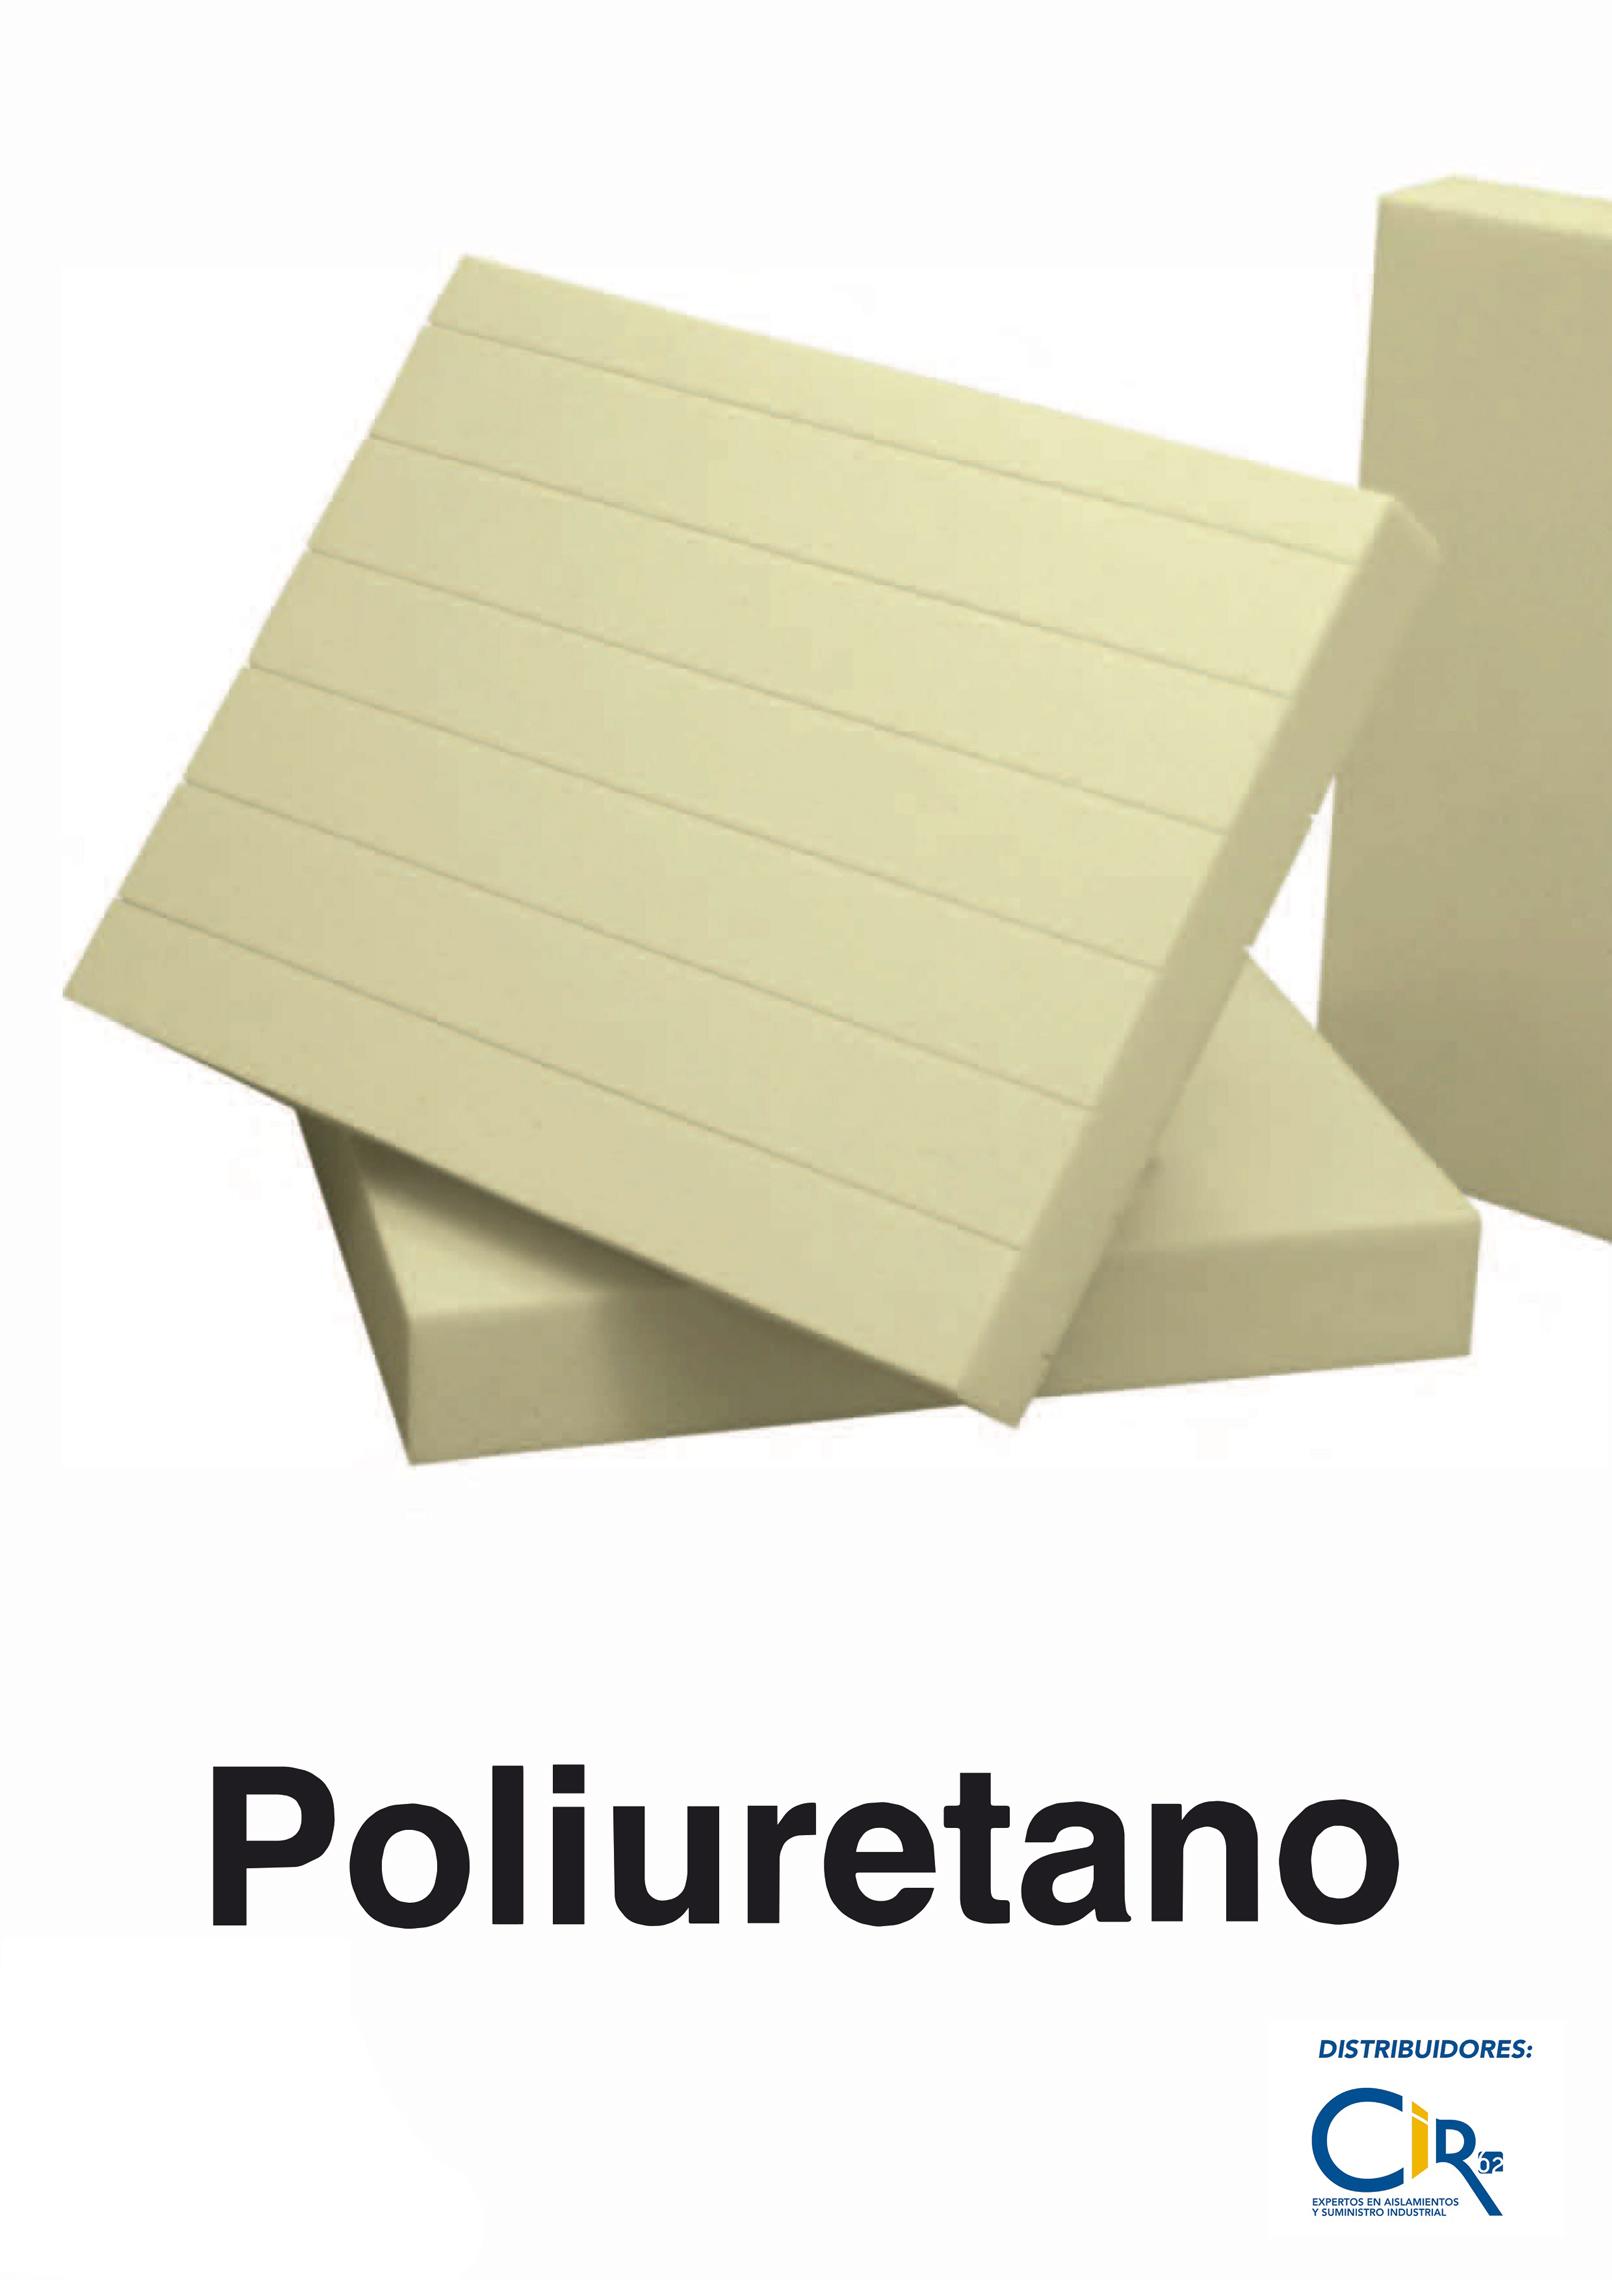 catalogo-poliuretano-rigido-portada-sell